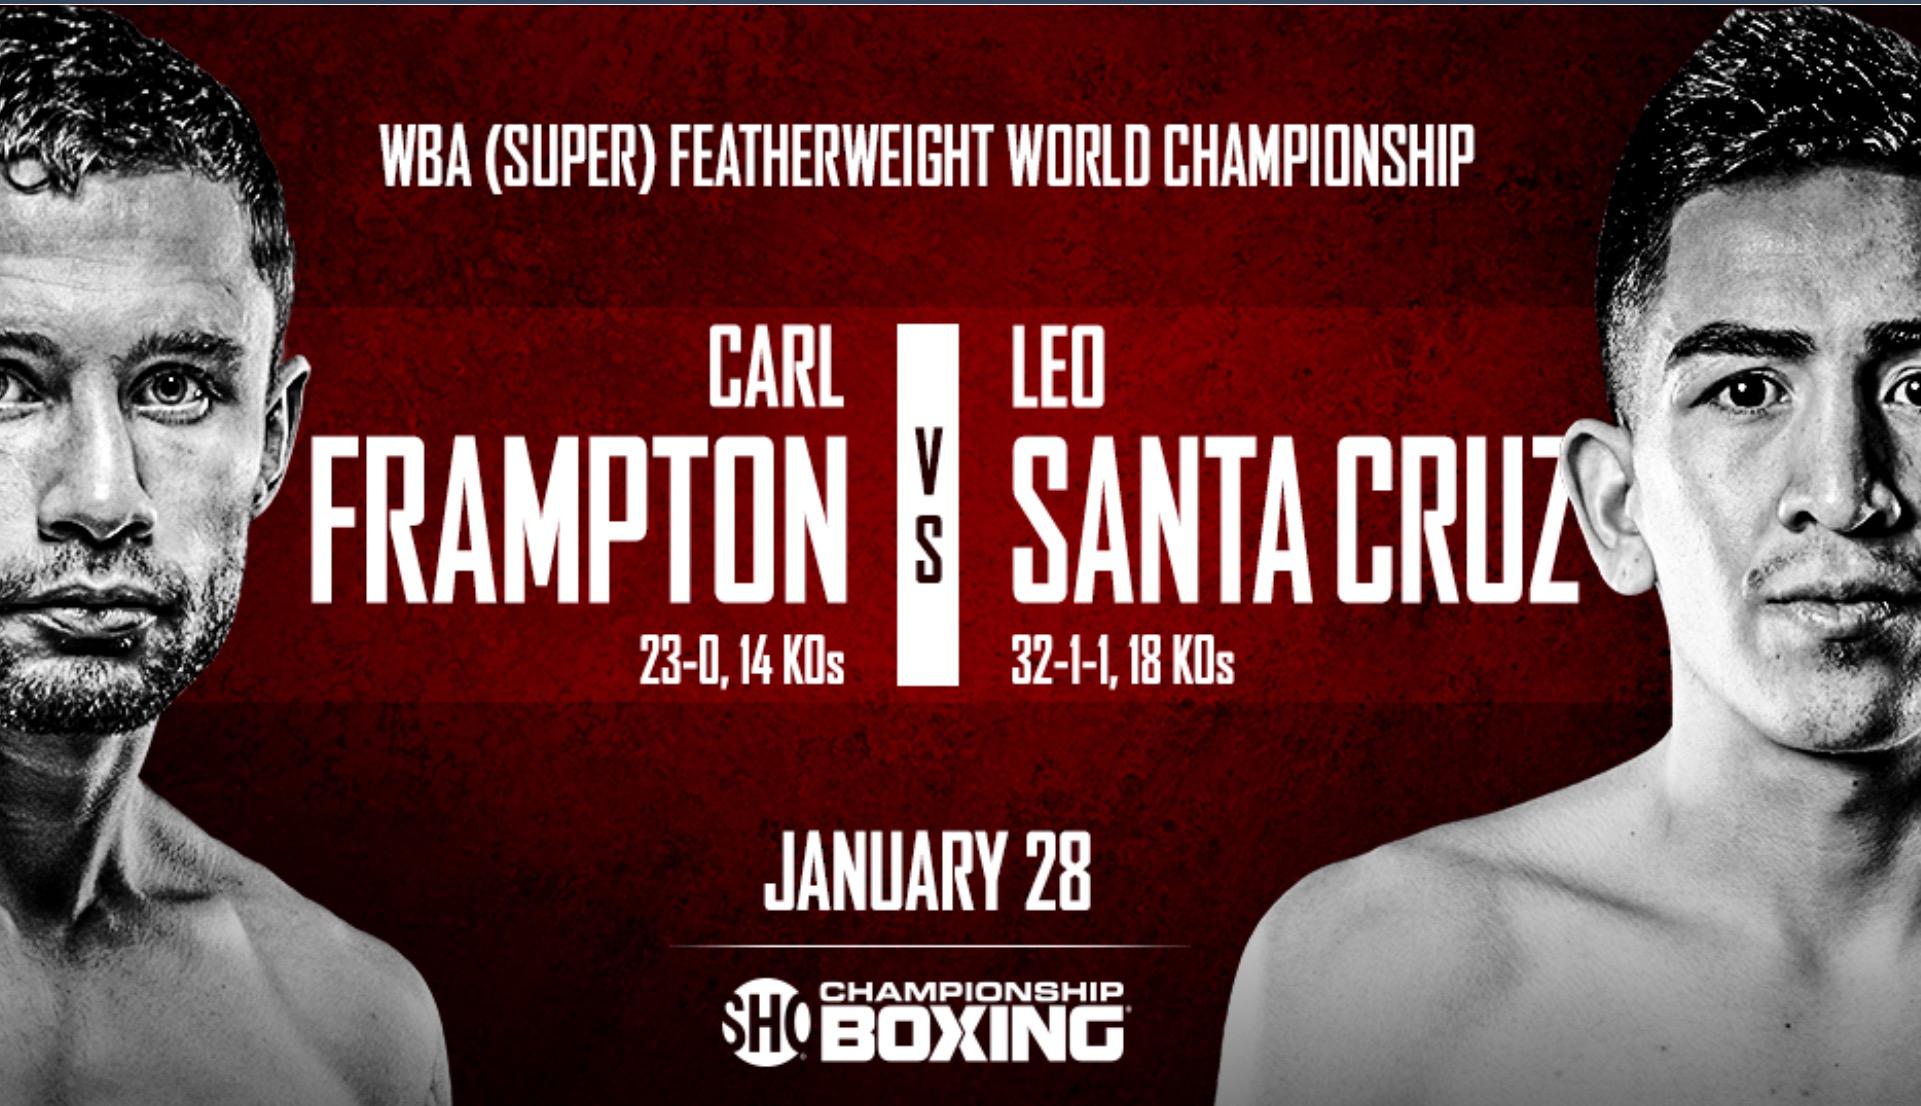 Carl Frampton vs. Leo Santa Cruz II will take place on January 28th. Photo: Showtime Sports